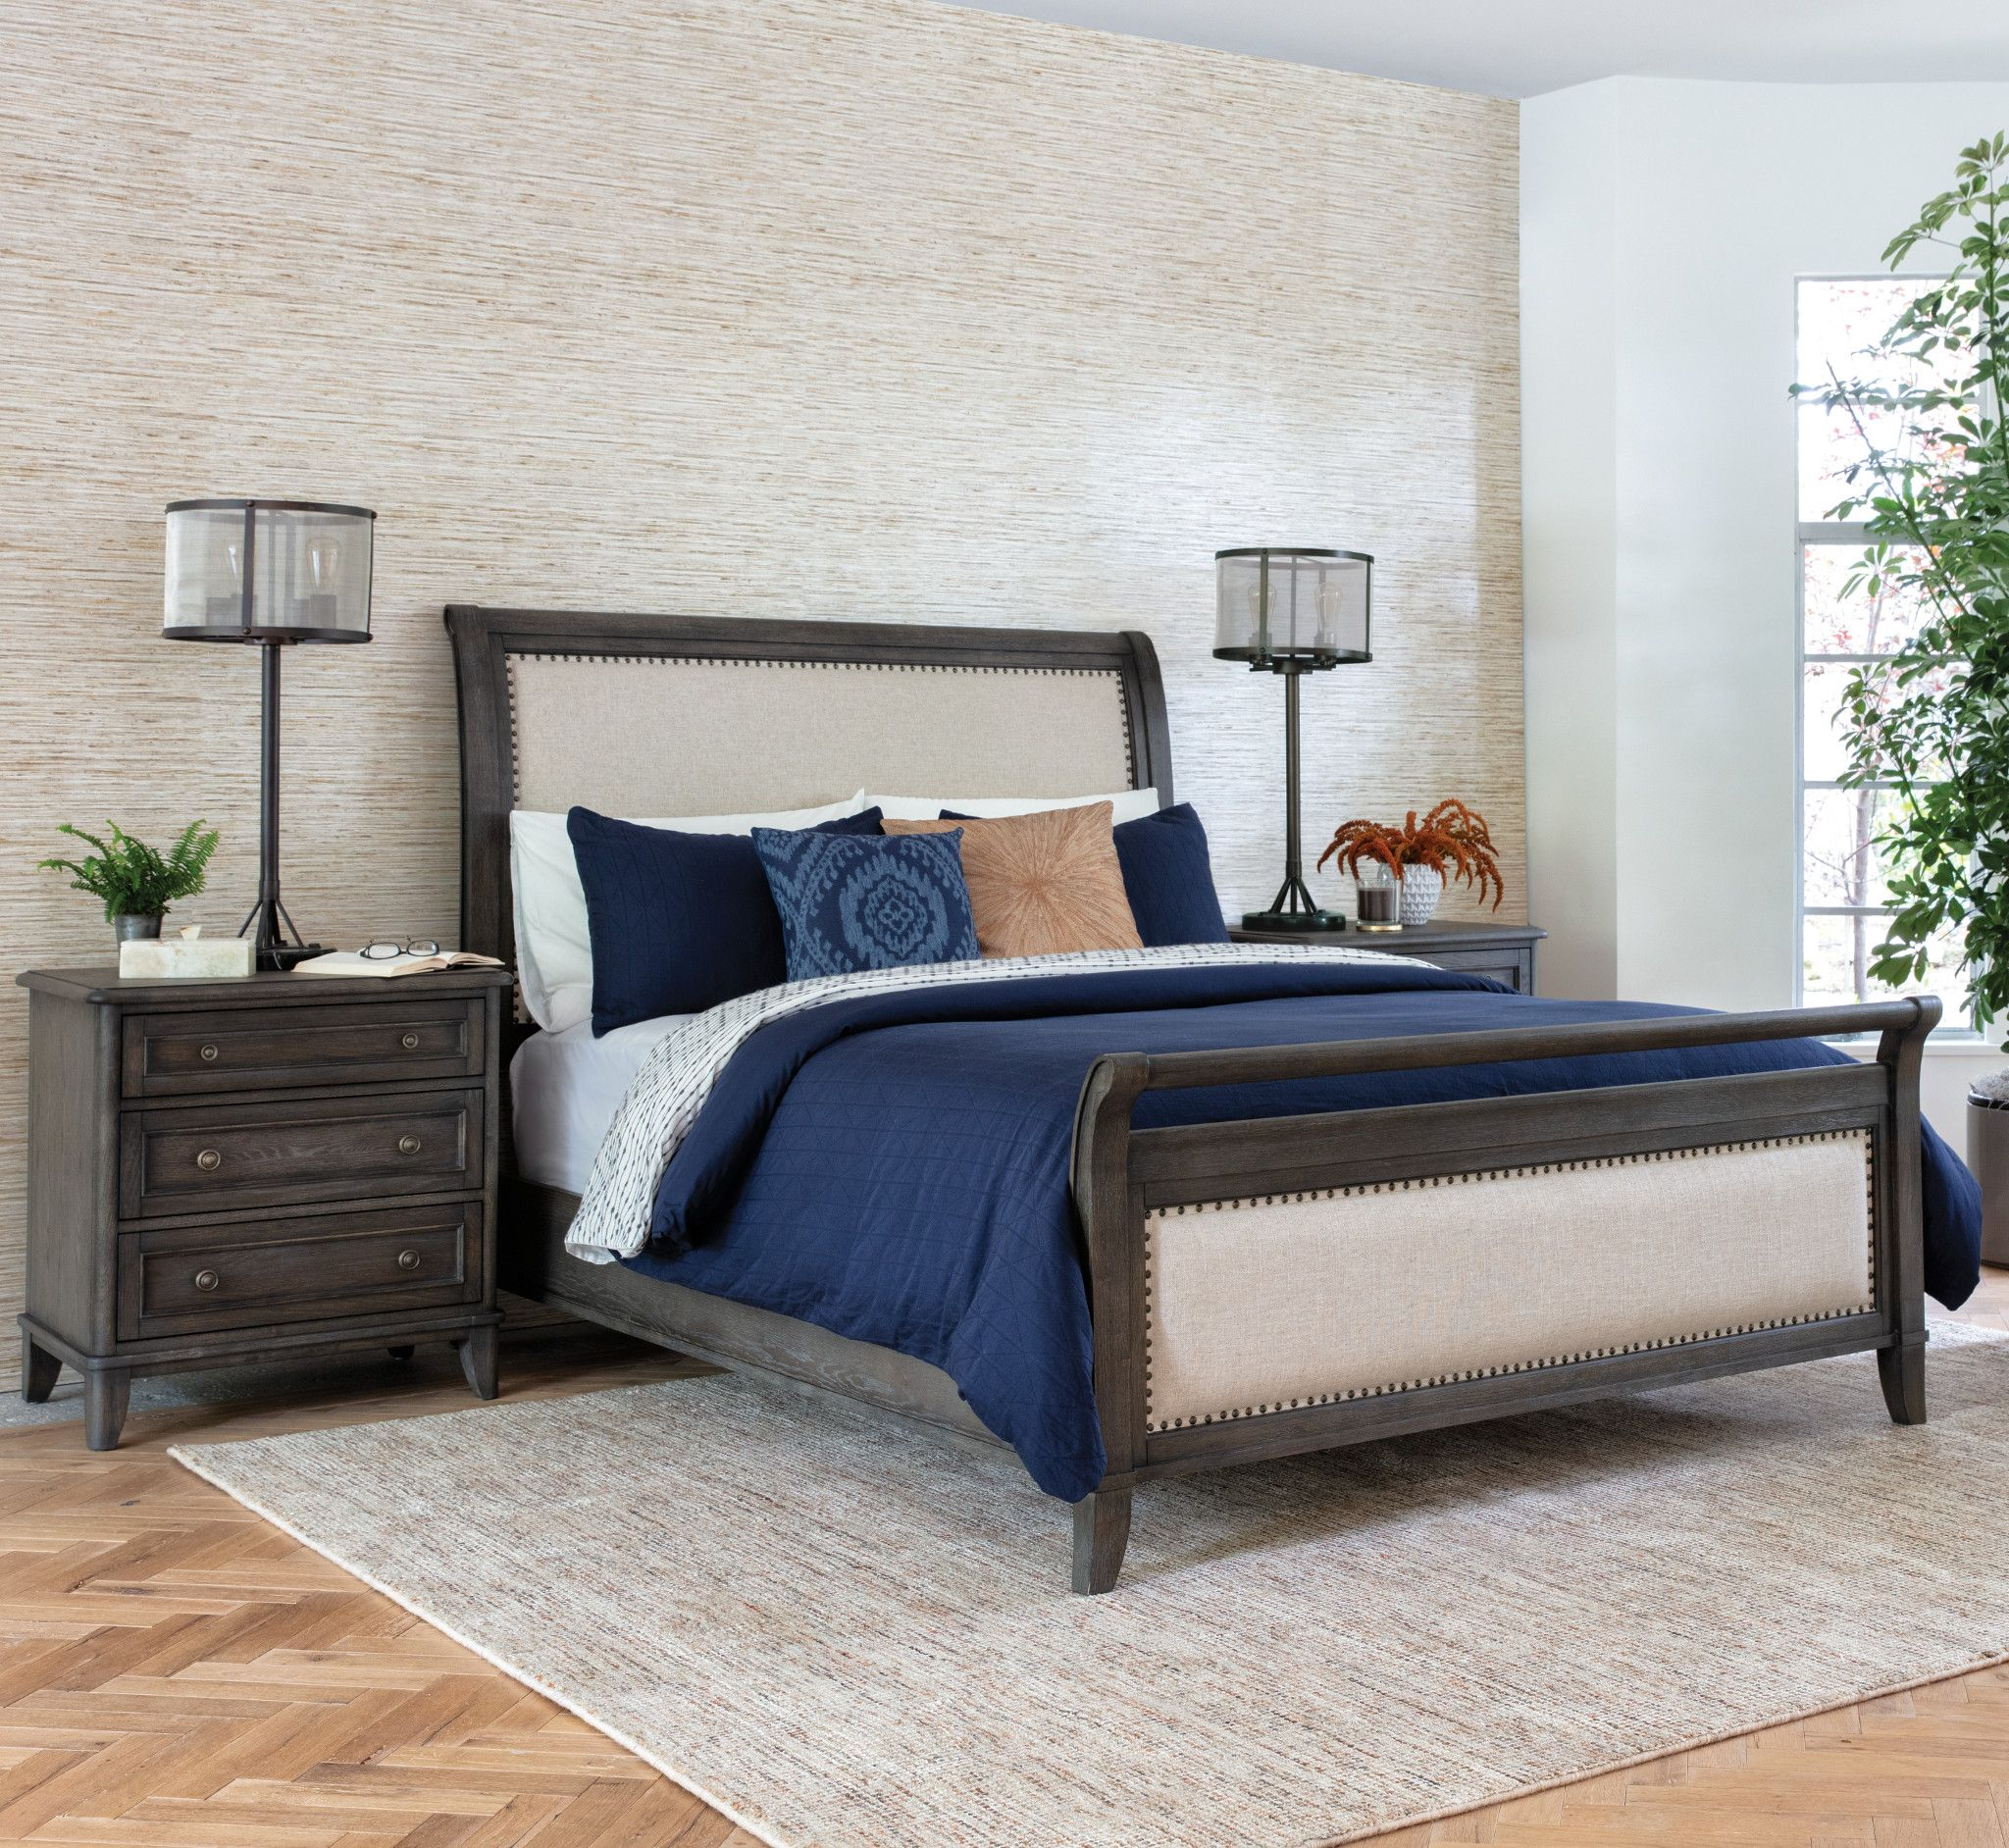 Best Candice Ii Queen Sleigh Bed Bed Sleigh Beds Sleigh Bed 400 x 300